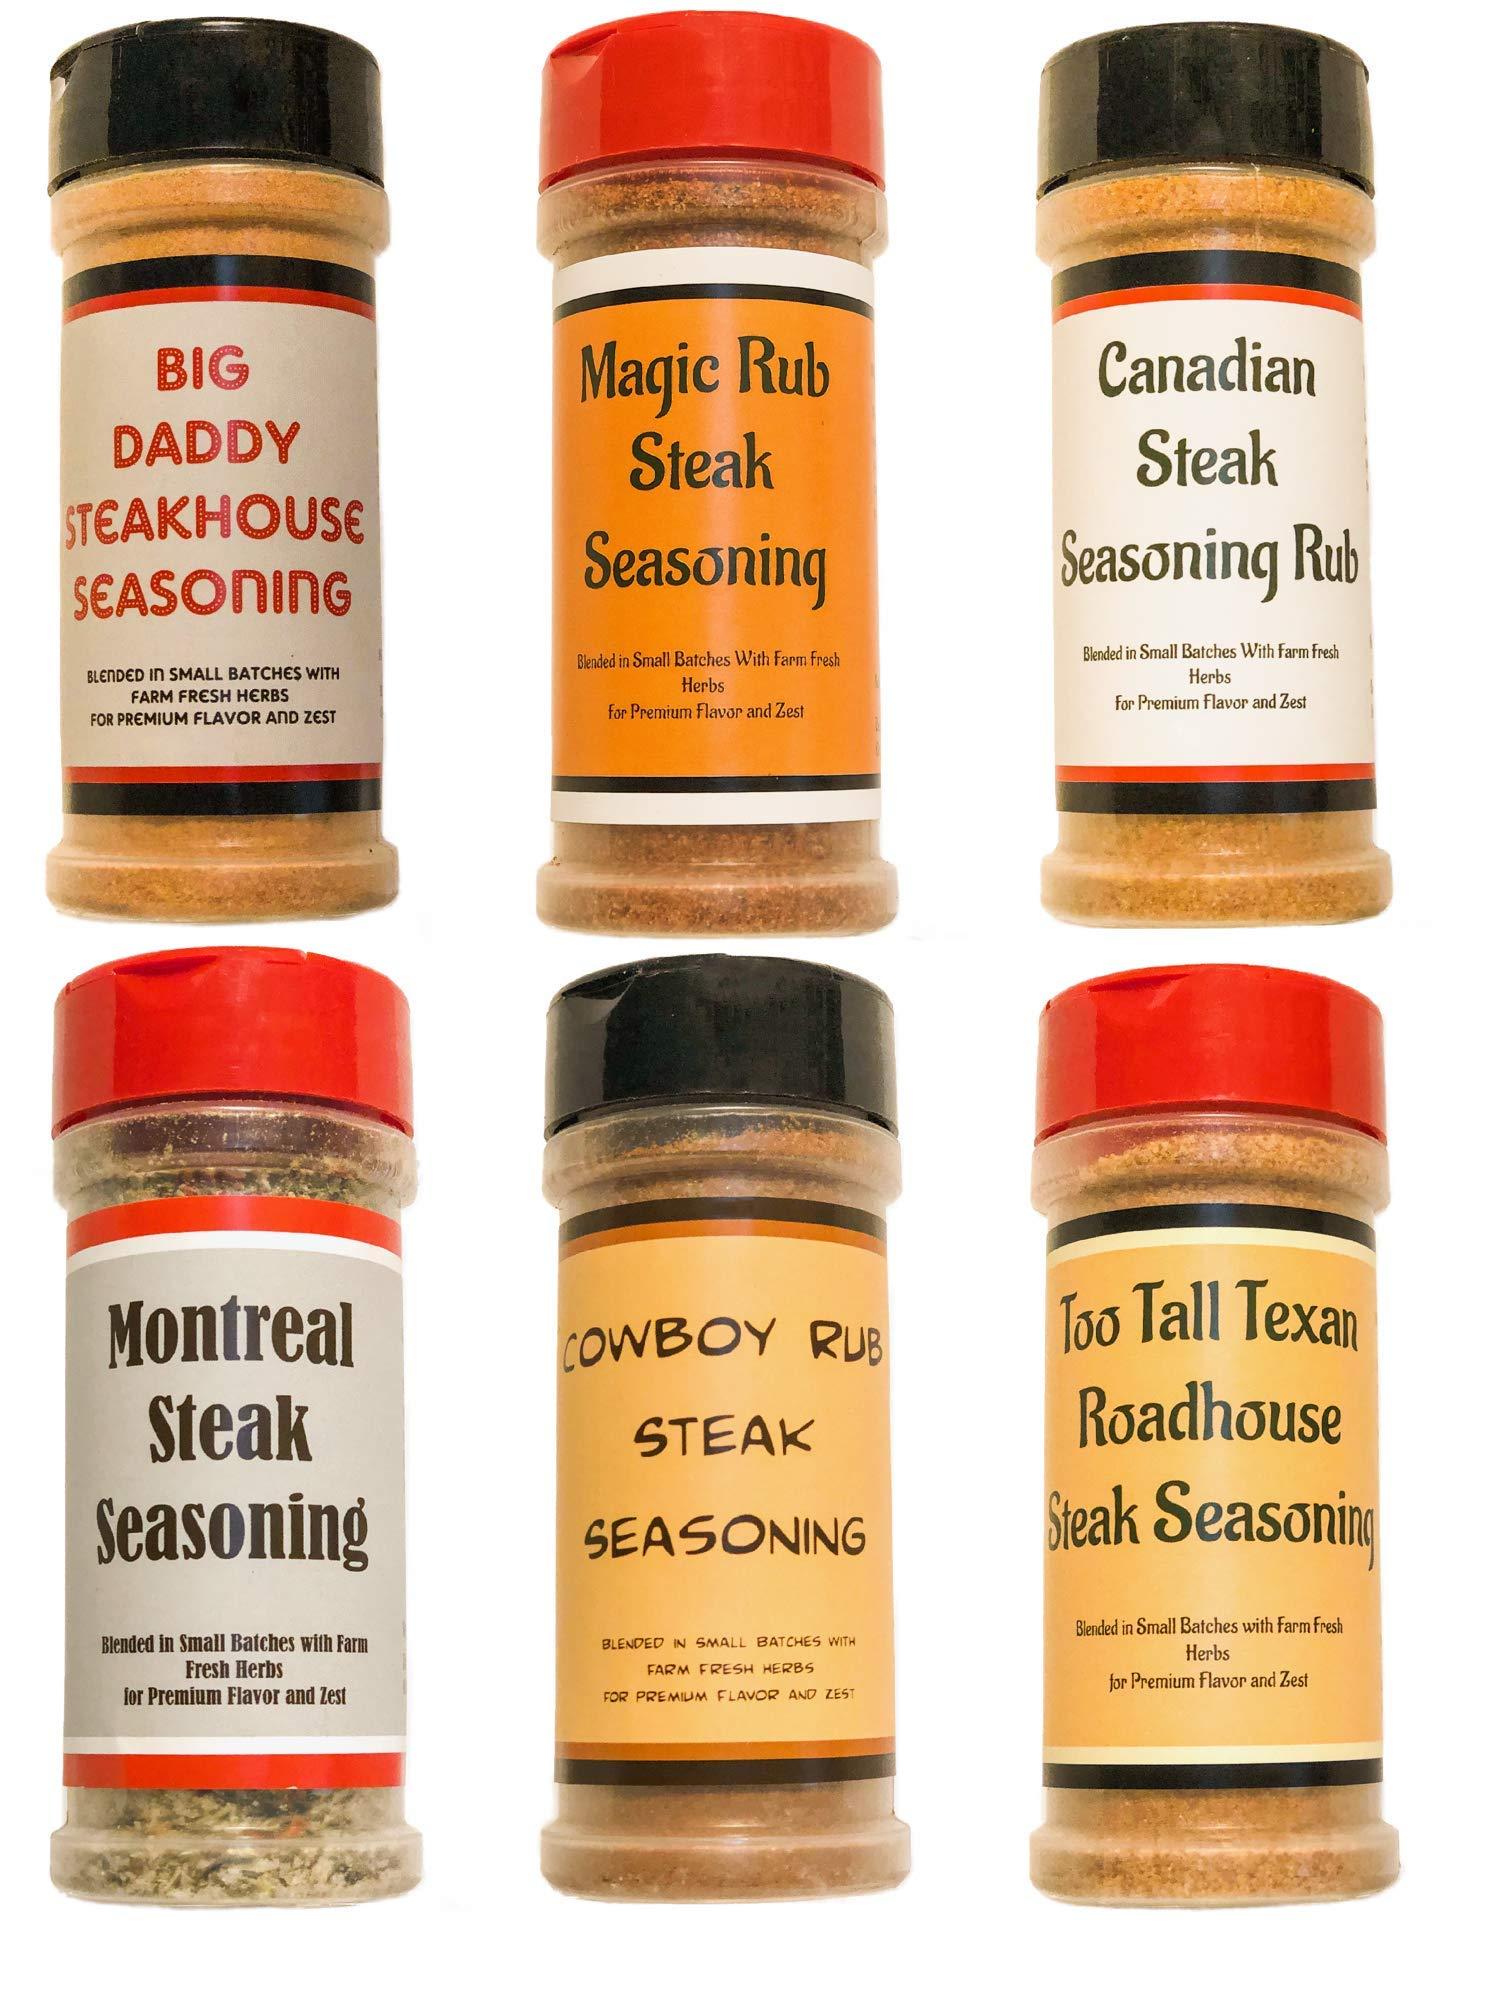 Premium | STEAK SEASONING Dry Rub Variety 6 Pack | Magic Steak Rub | Canadian Steak Seasoning | Big Daddy Steakhouse | Montreal Steak | Cowboy Rub | Too Tall Texas Roadhouse Seasoning by June Moon Spice Company